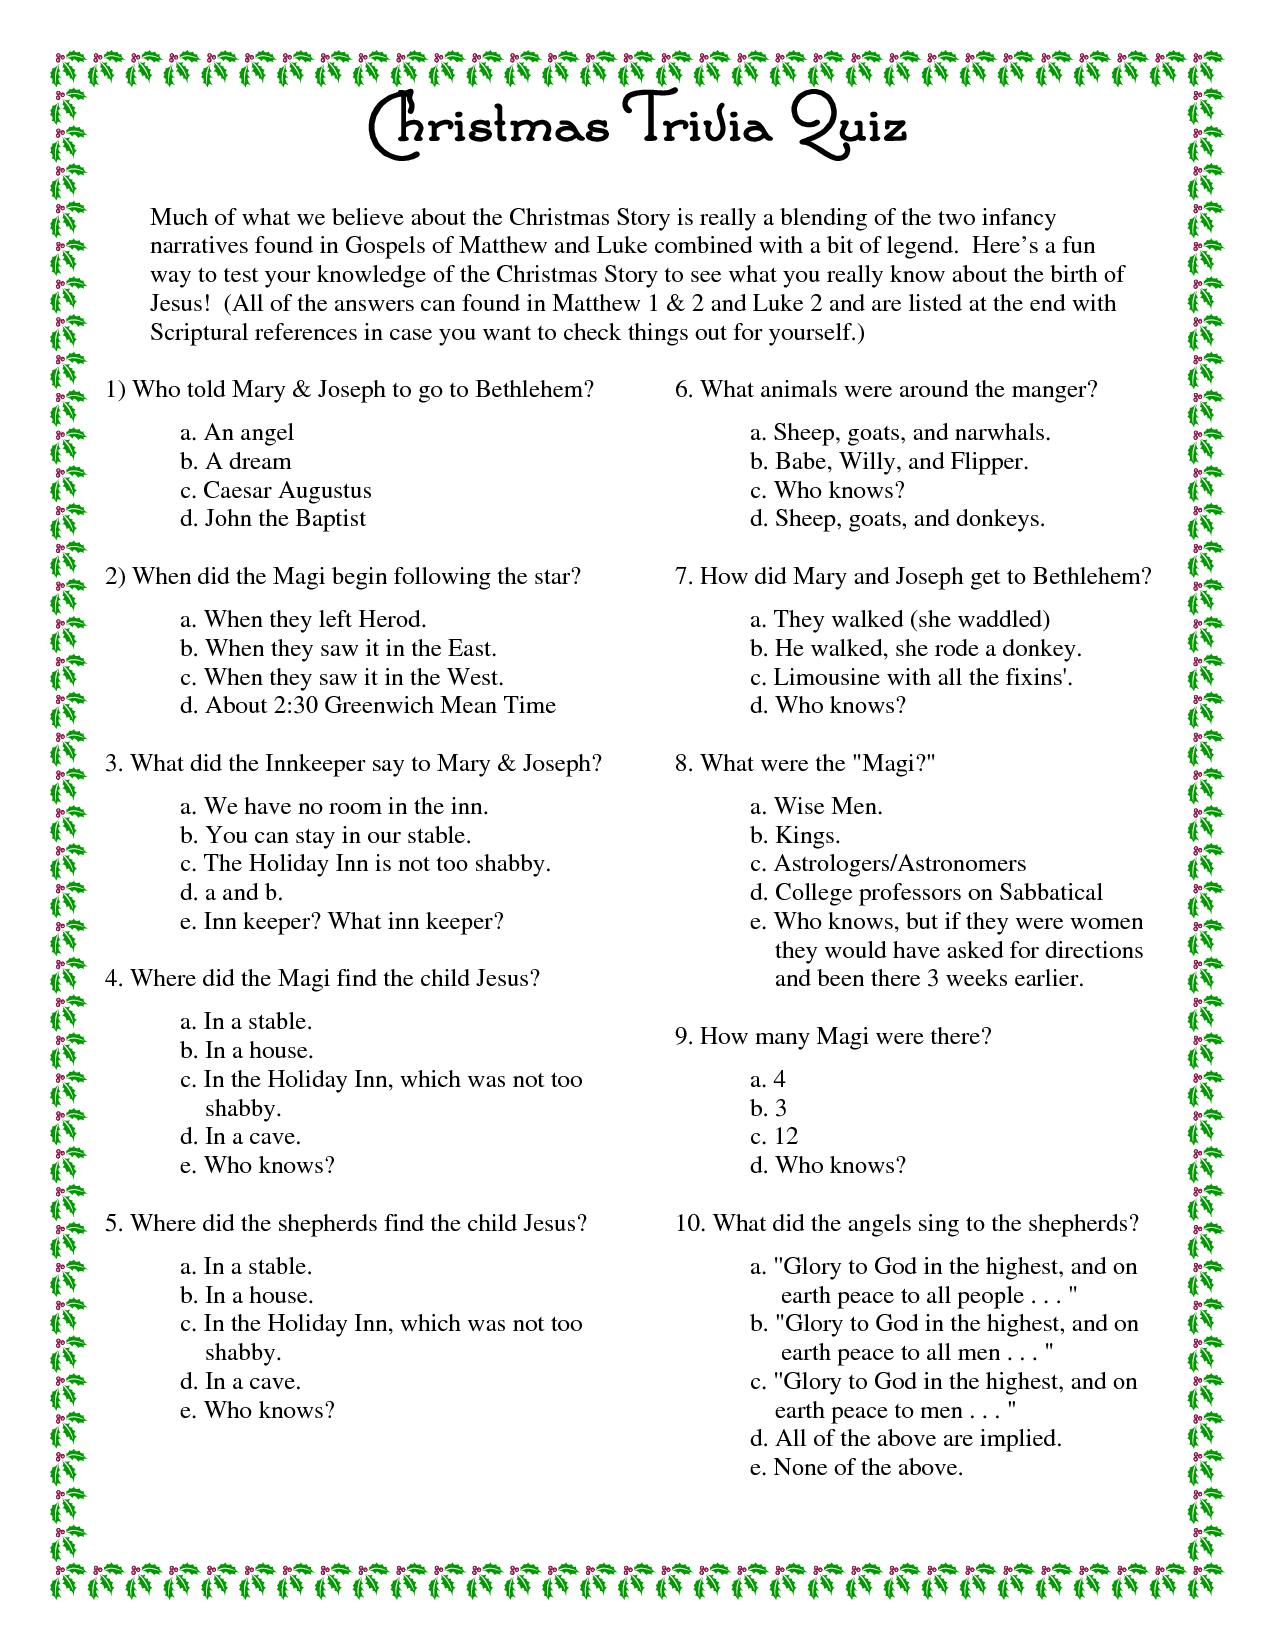 Printable+Christmas+Trivia+Questions+And+Answers | Christmas - Free Printable Trivia Questions And Answers